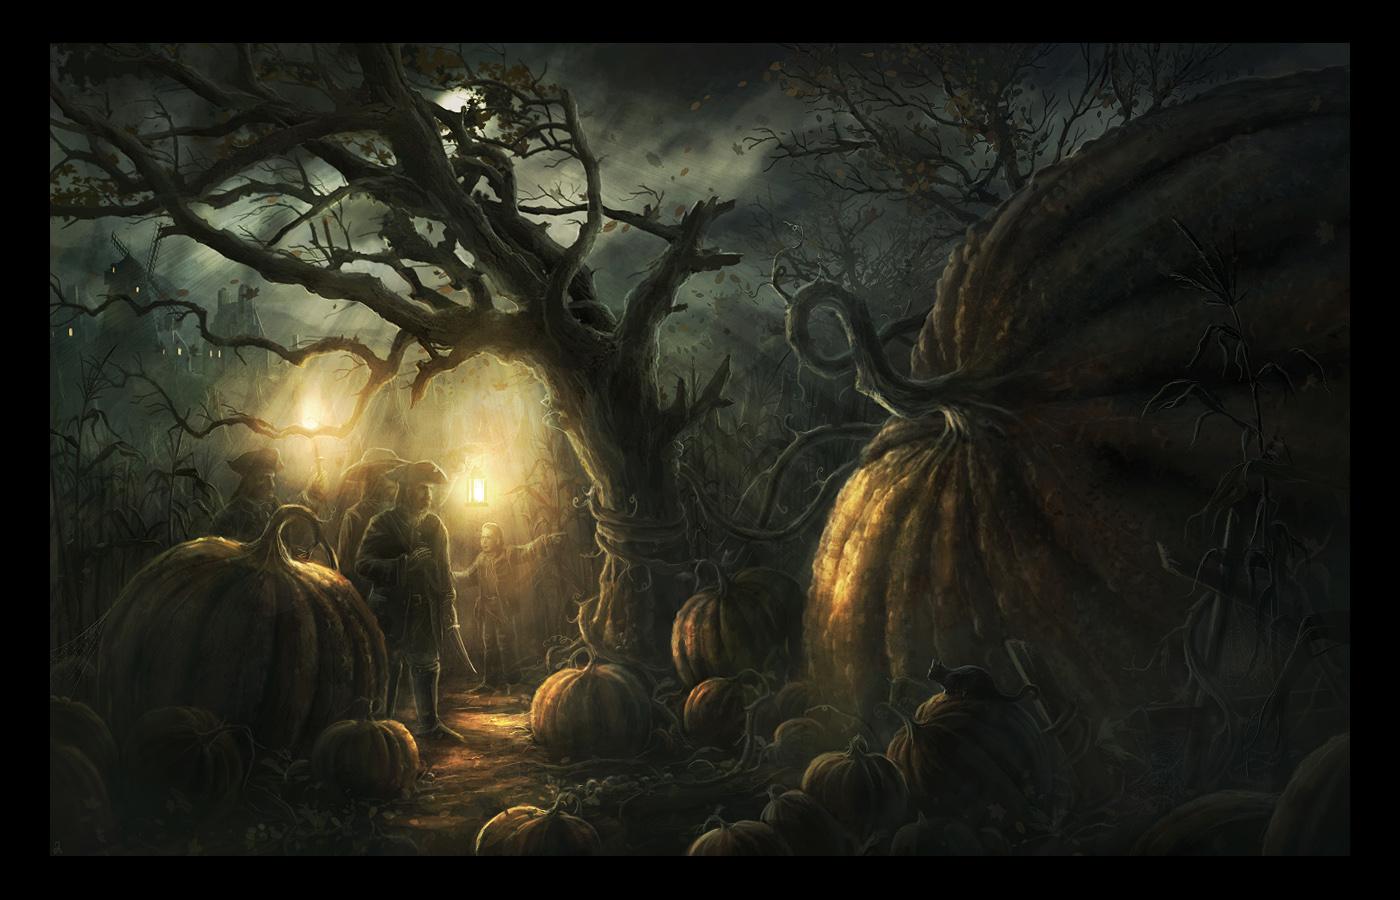 Mother Pumpkin by RadoJavor on DeviantArt